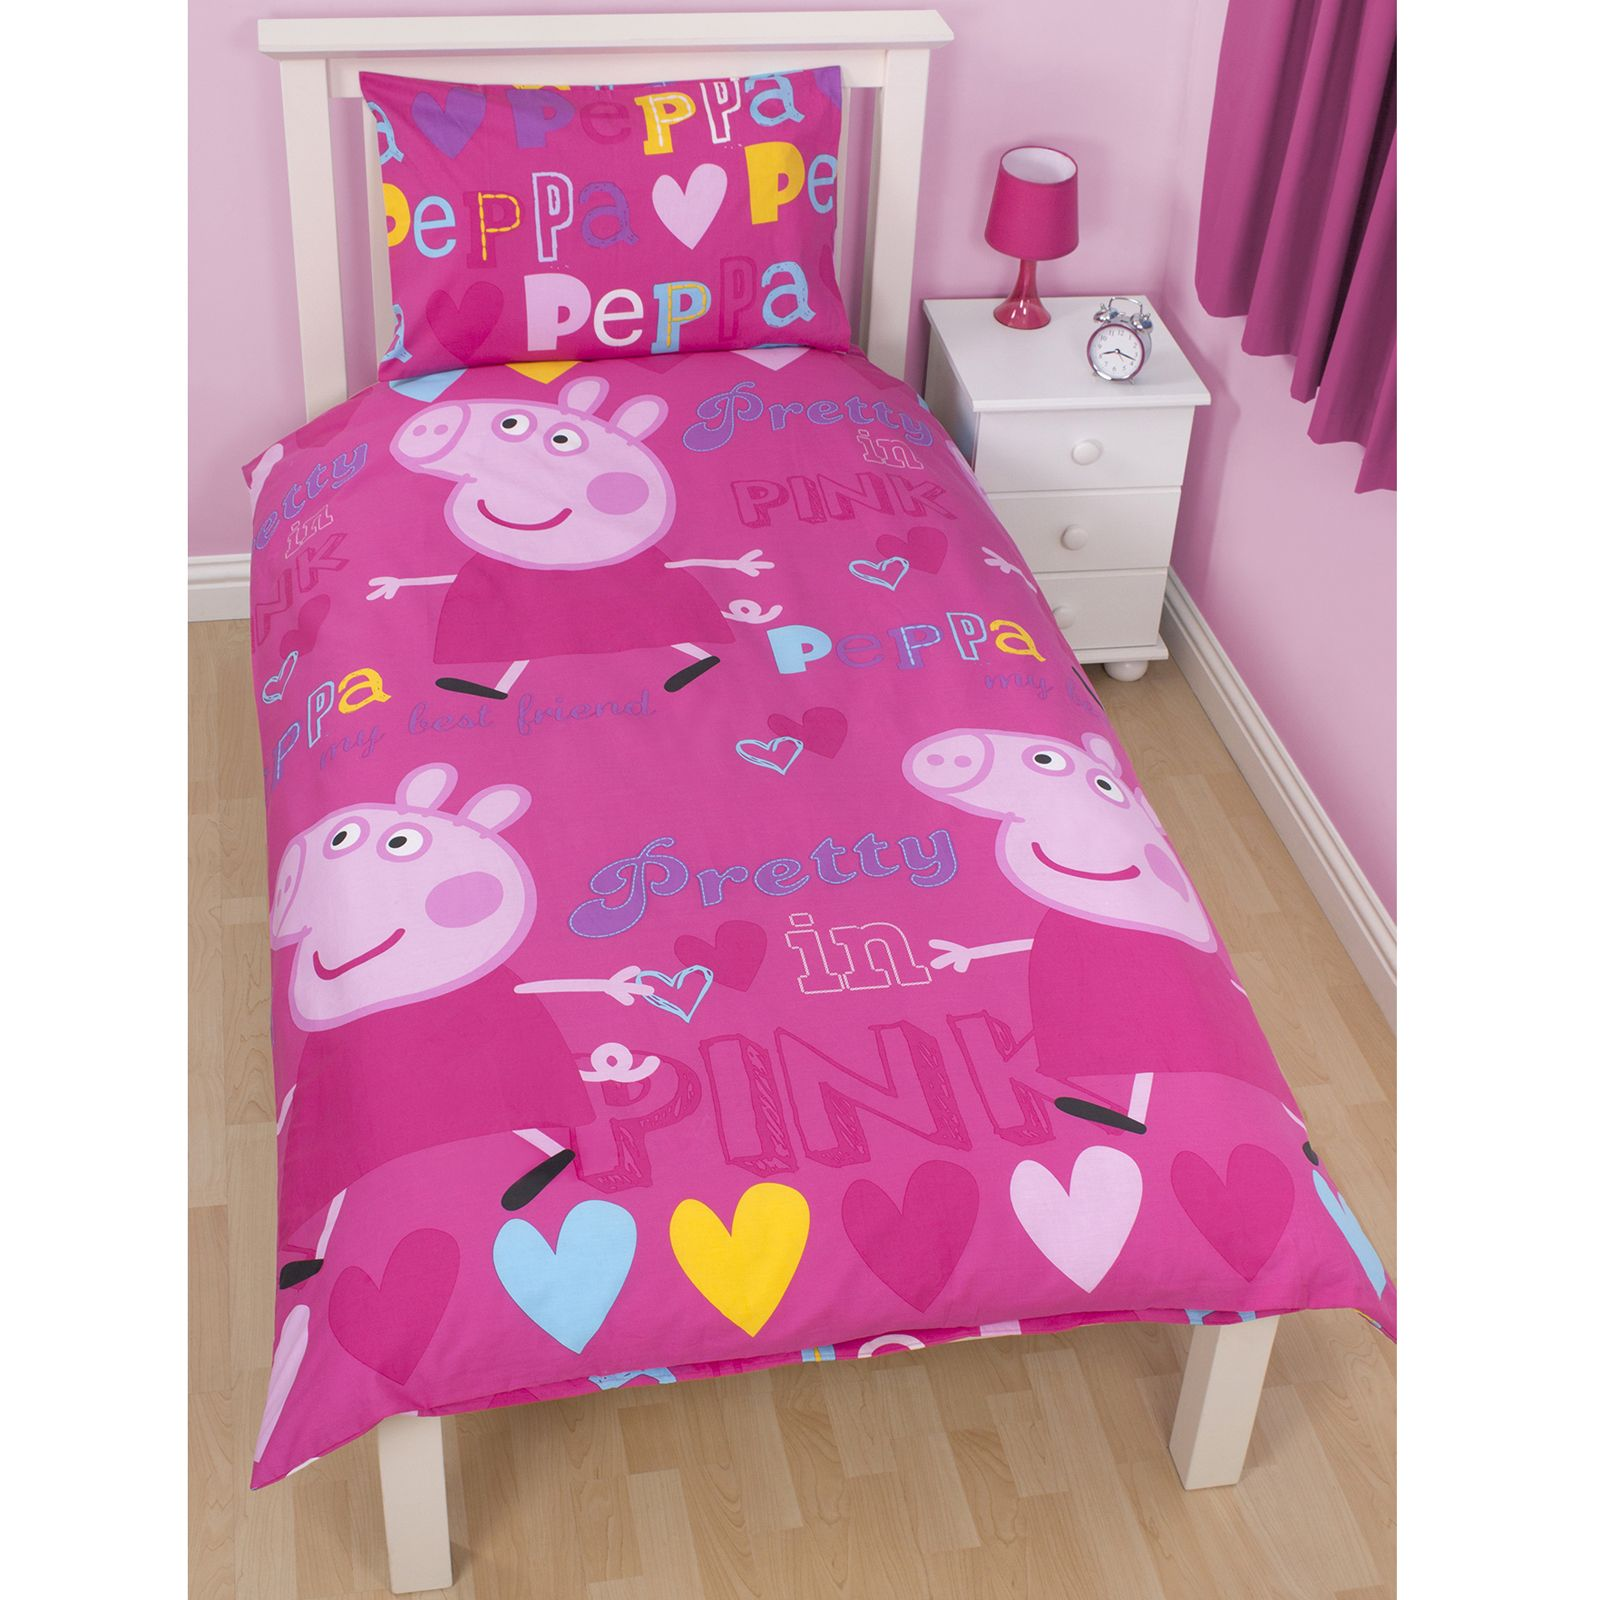 Peppa Pig Bedroom Accessories Peppa Pig Amp George Pig Duvet Quilt Covers Toddler Single